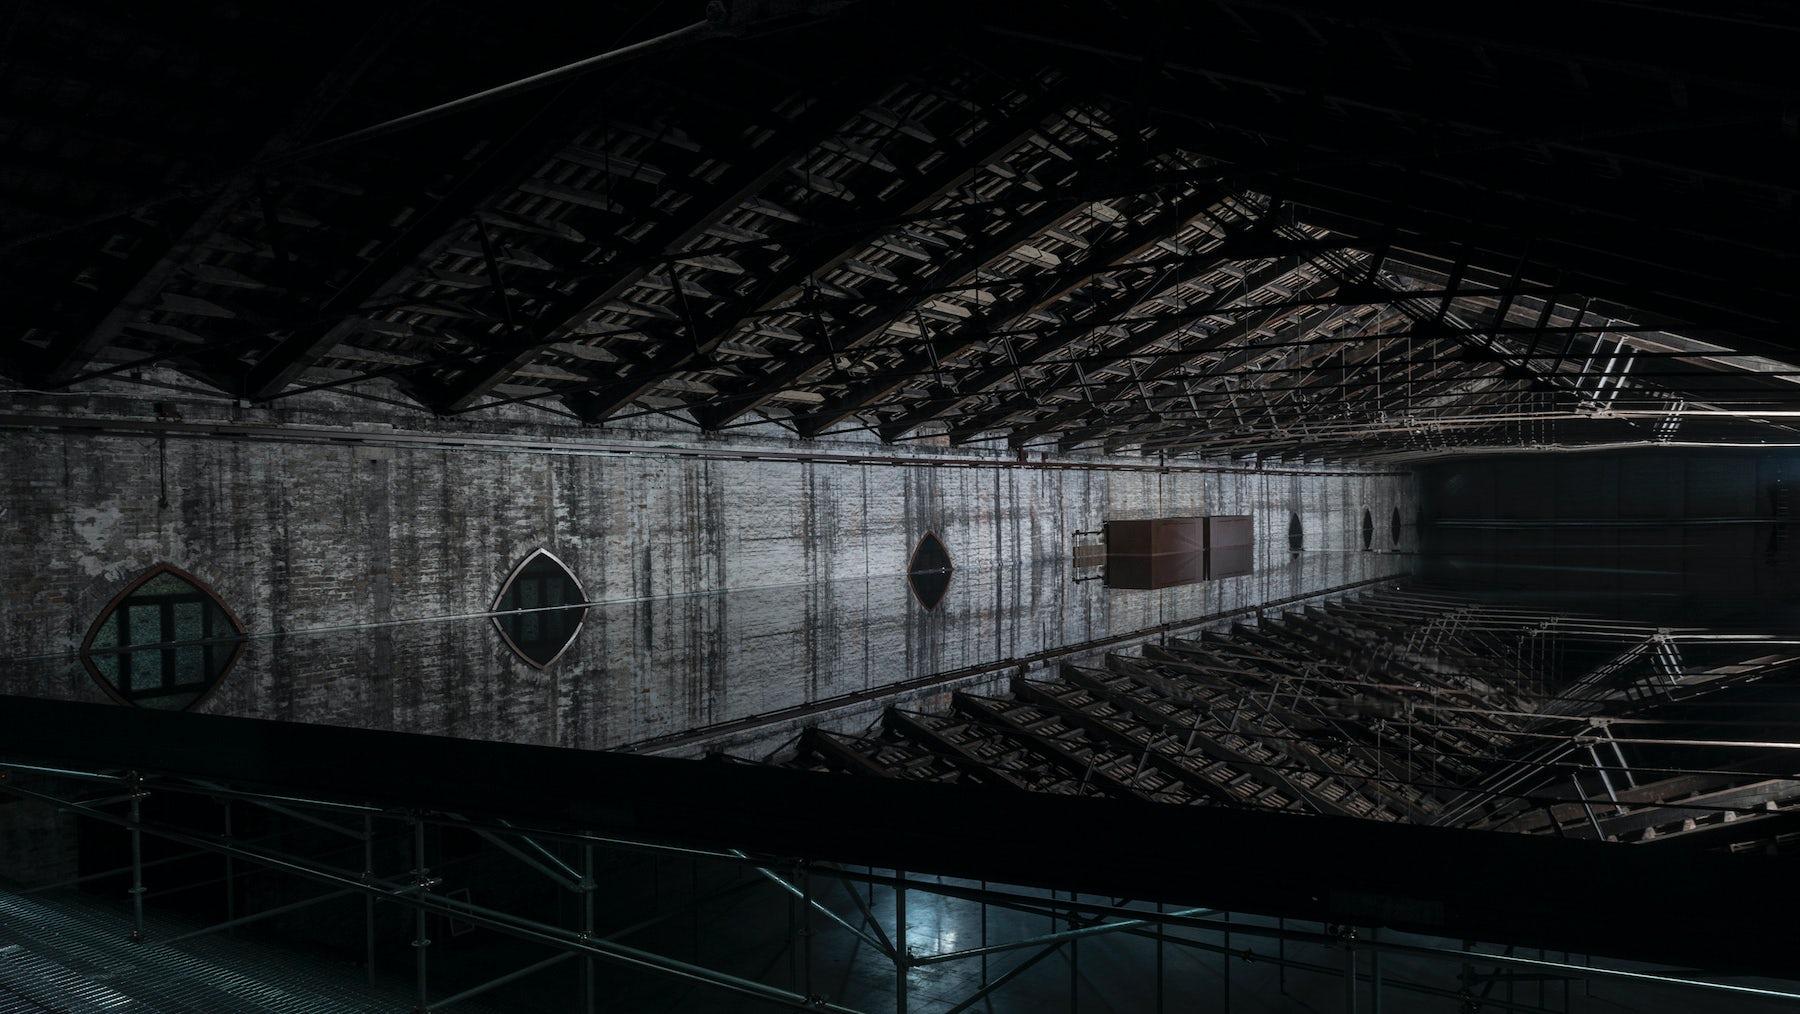 Giorgio Andreotta Calo's reflecting pond at the Italian pavilion | Source: Courtesy